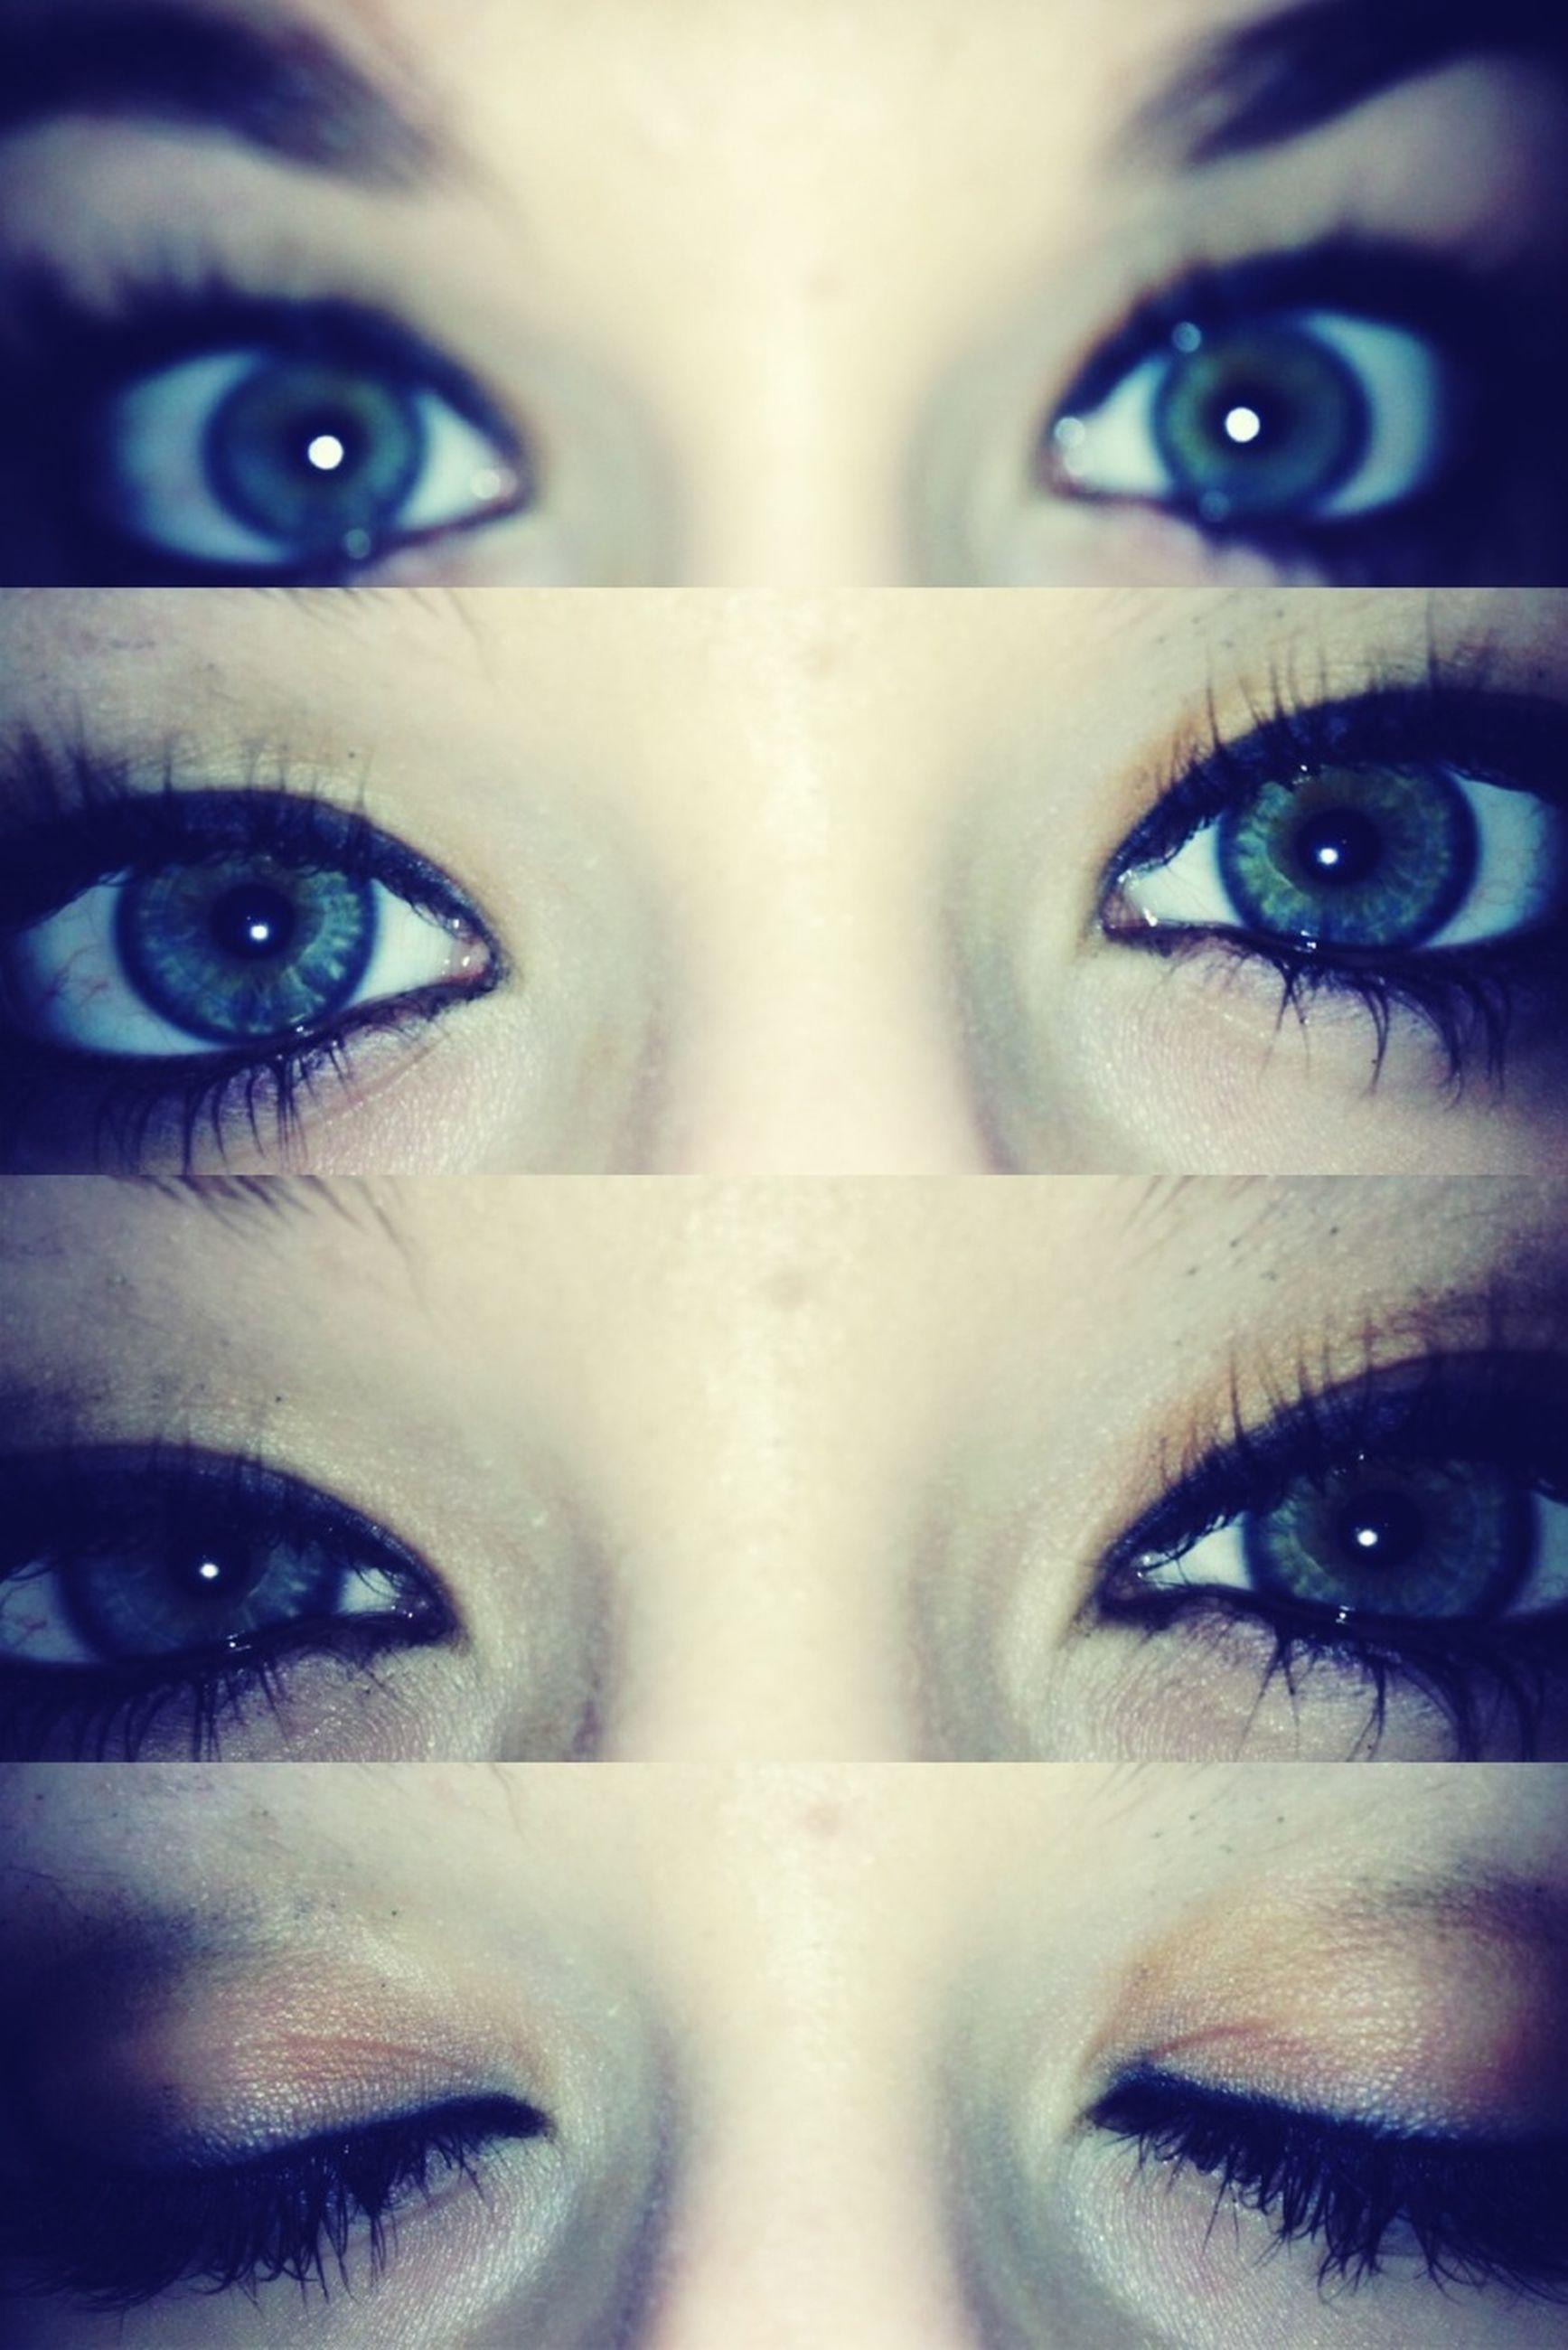 looking at camera, close-up, portrait, human eye, human face, young adult, headshot, indoors, lifestyles, young women, studio shot, front view, part of, eyelash, human skin, make-up